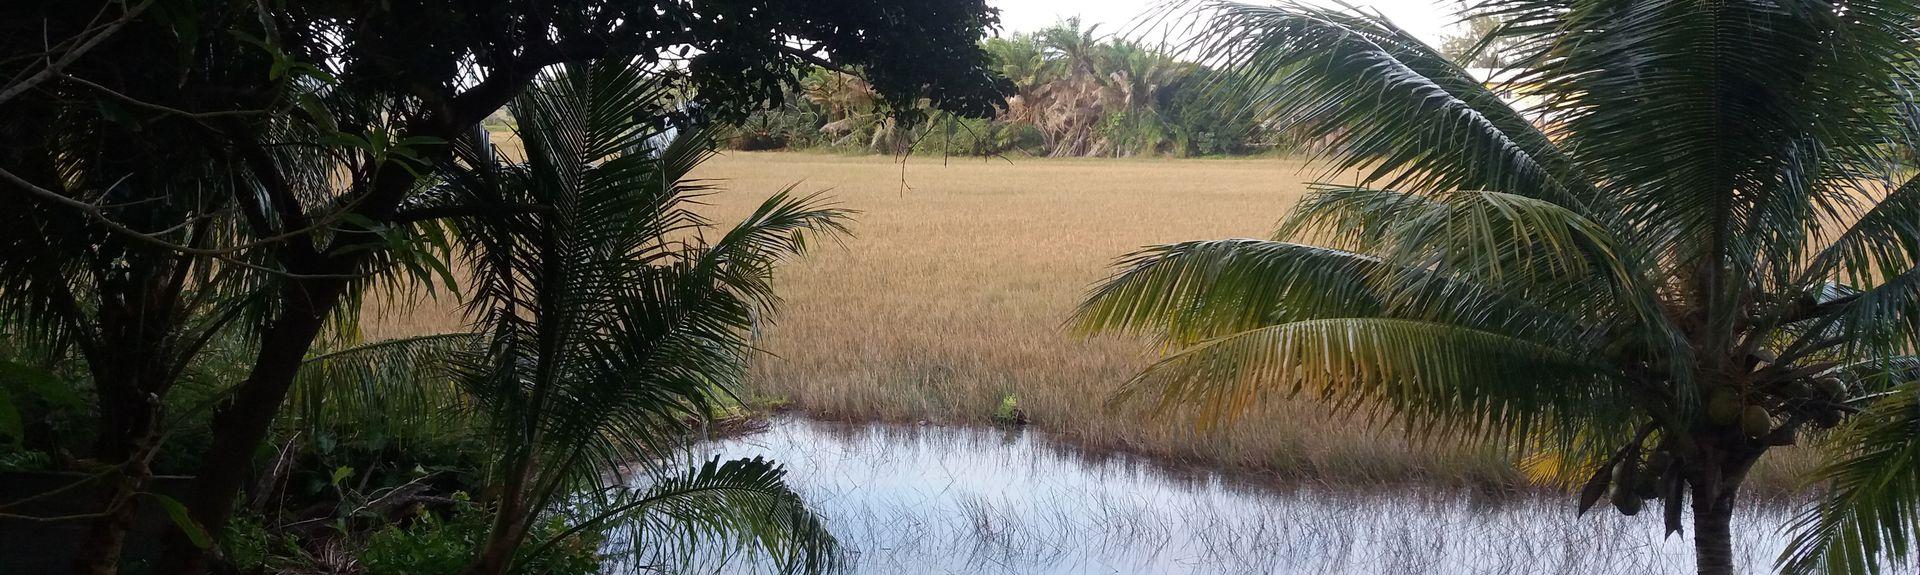 São Sebastião do Passé, Catu, State of Bahia, Brazil